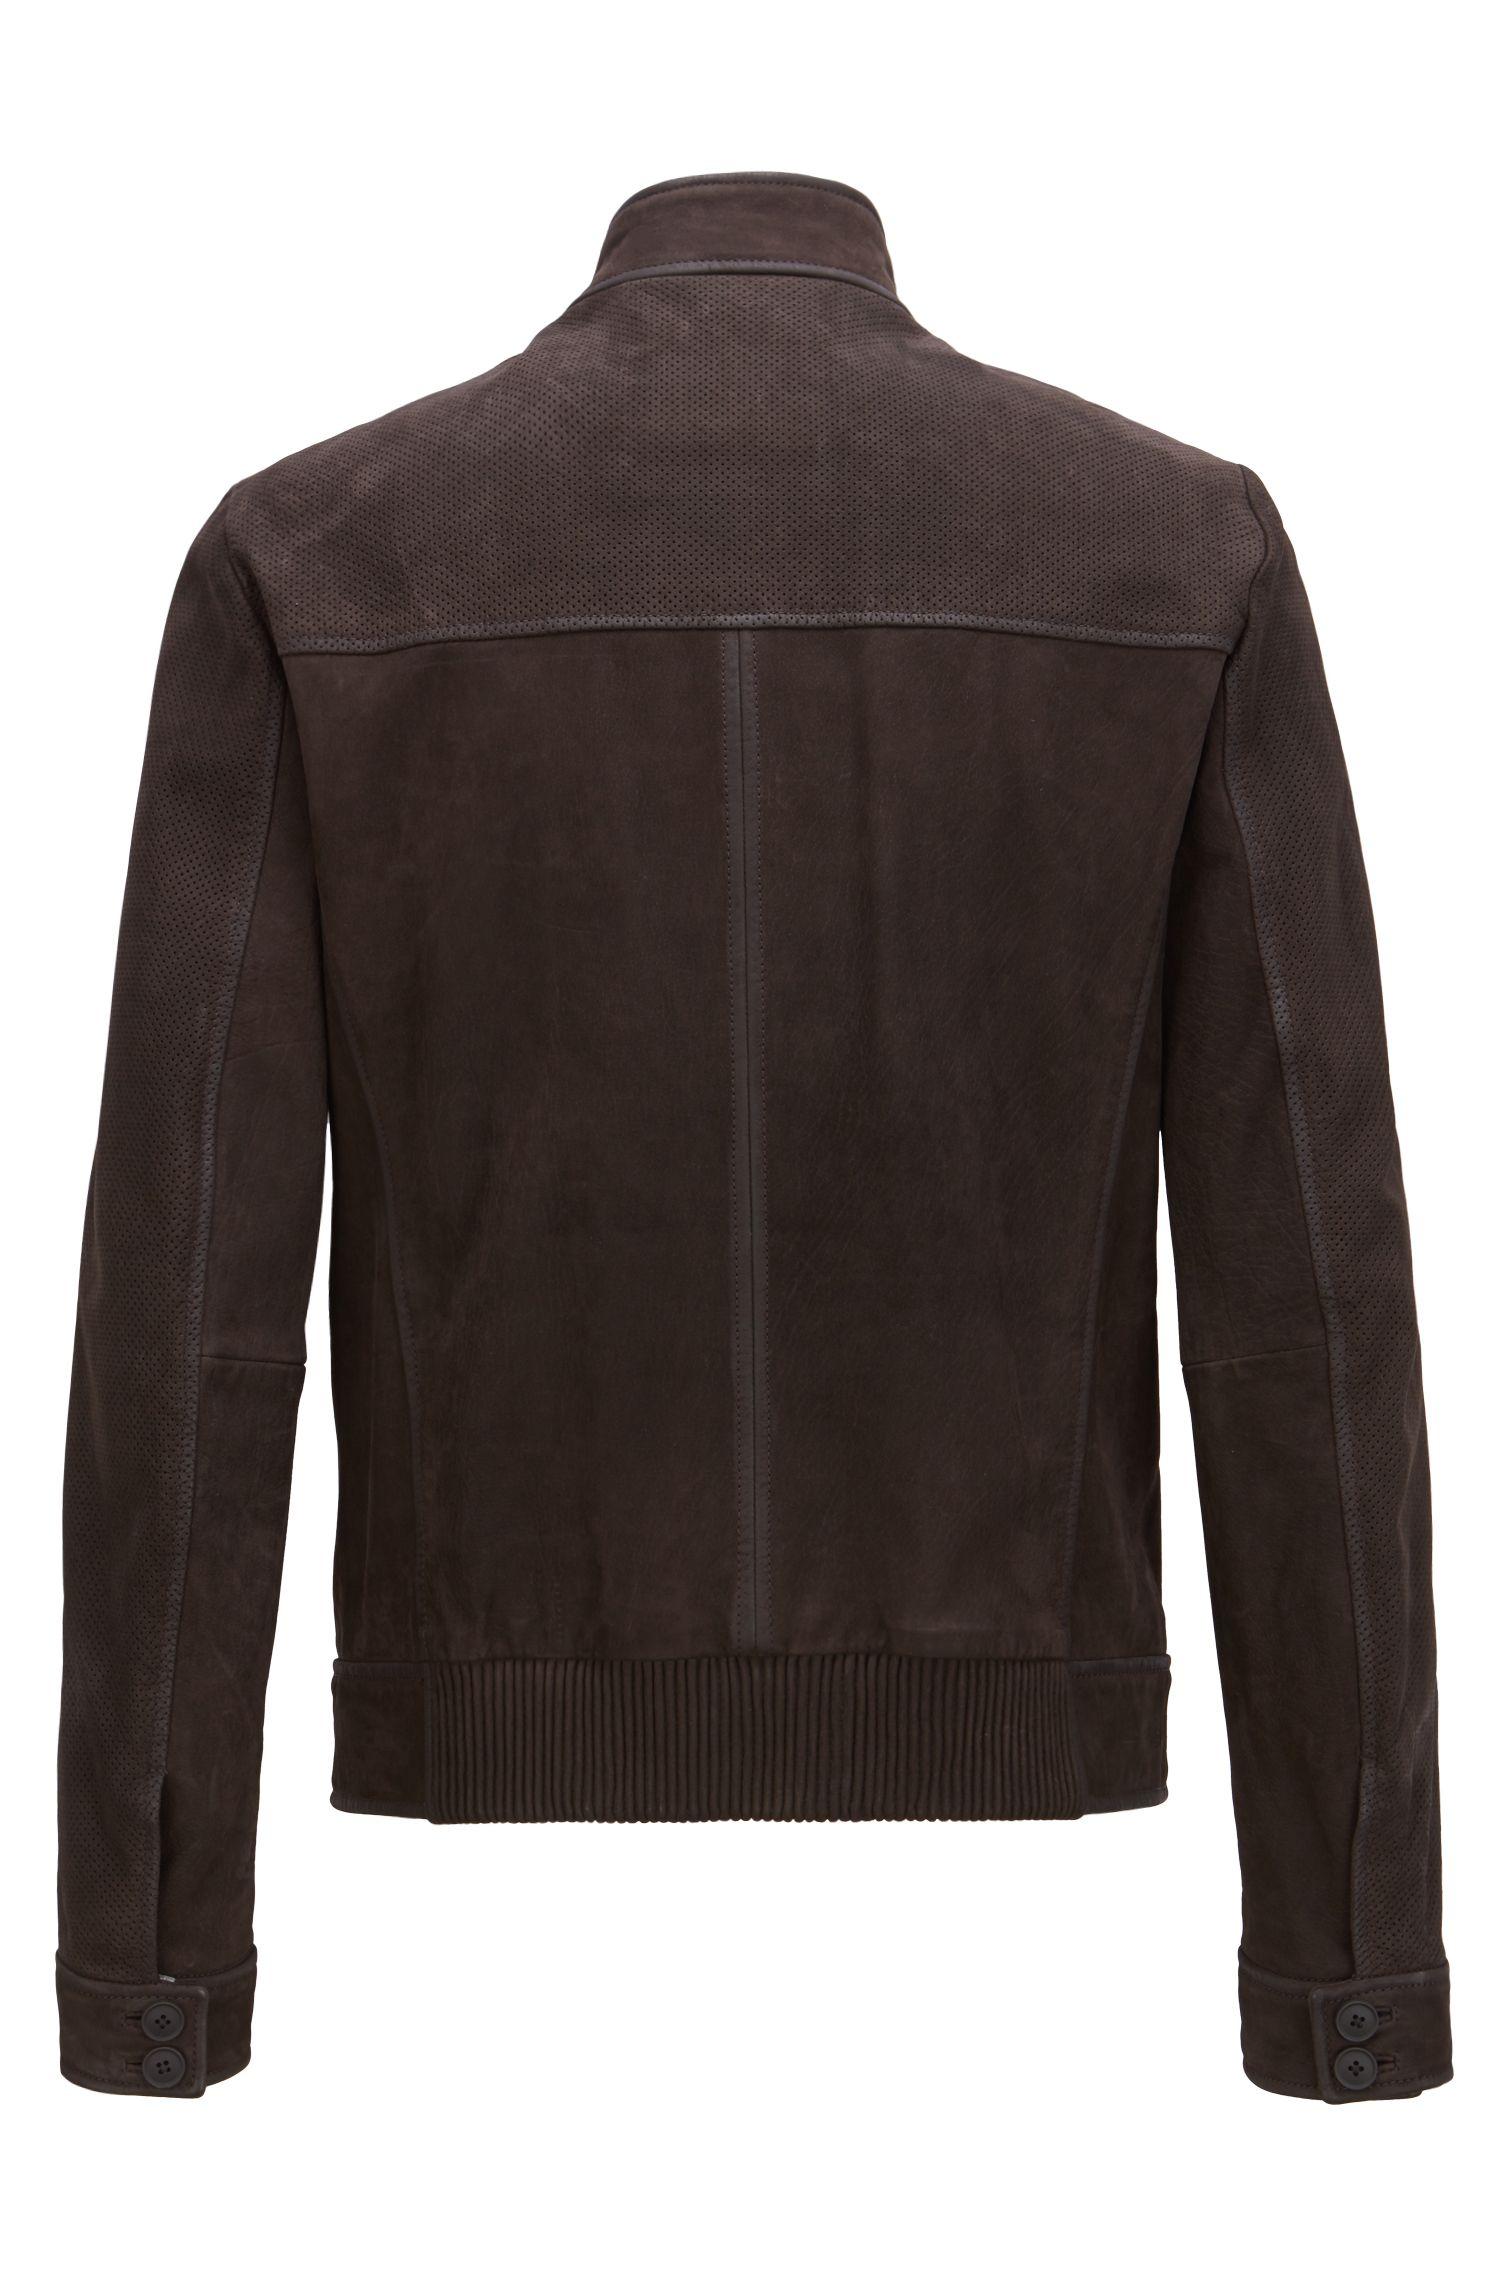 Bikerjas van buffelnubuck met geperforeerde details, Donkerbruin